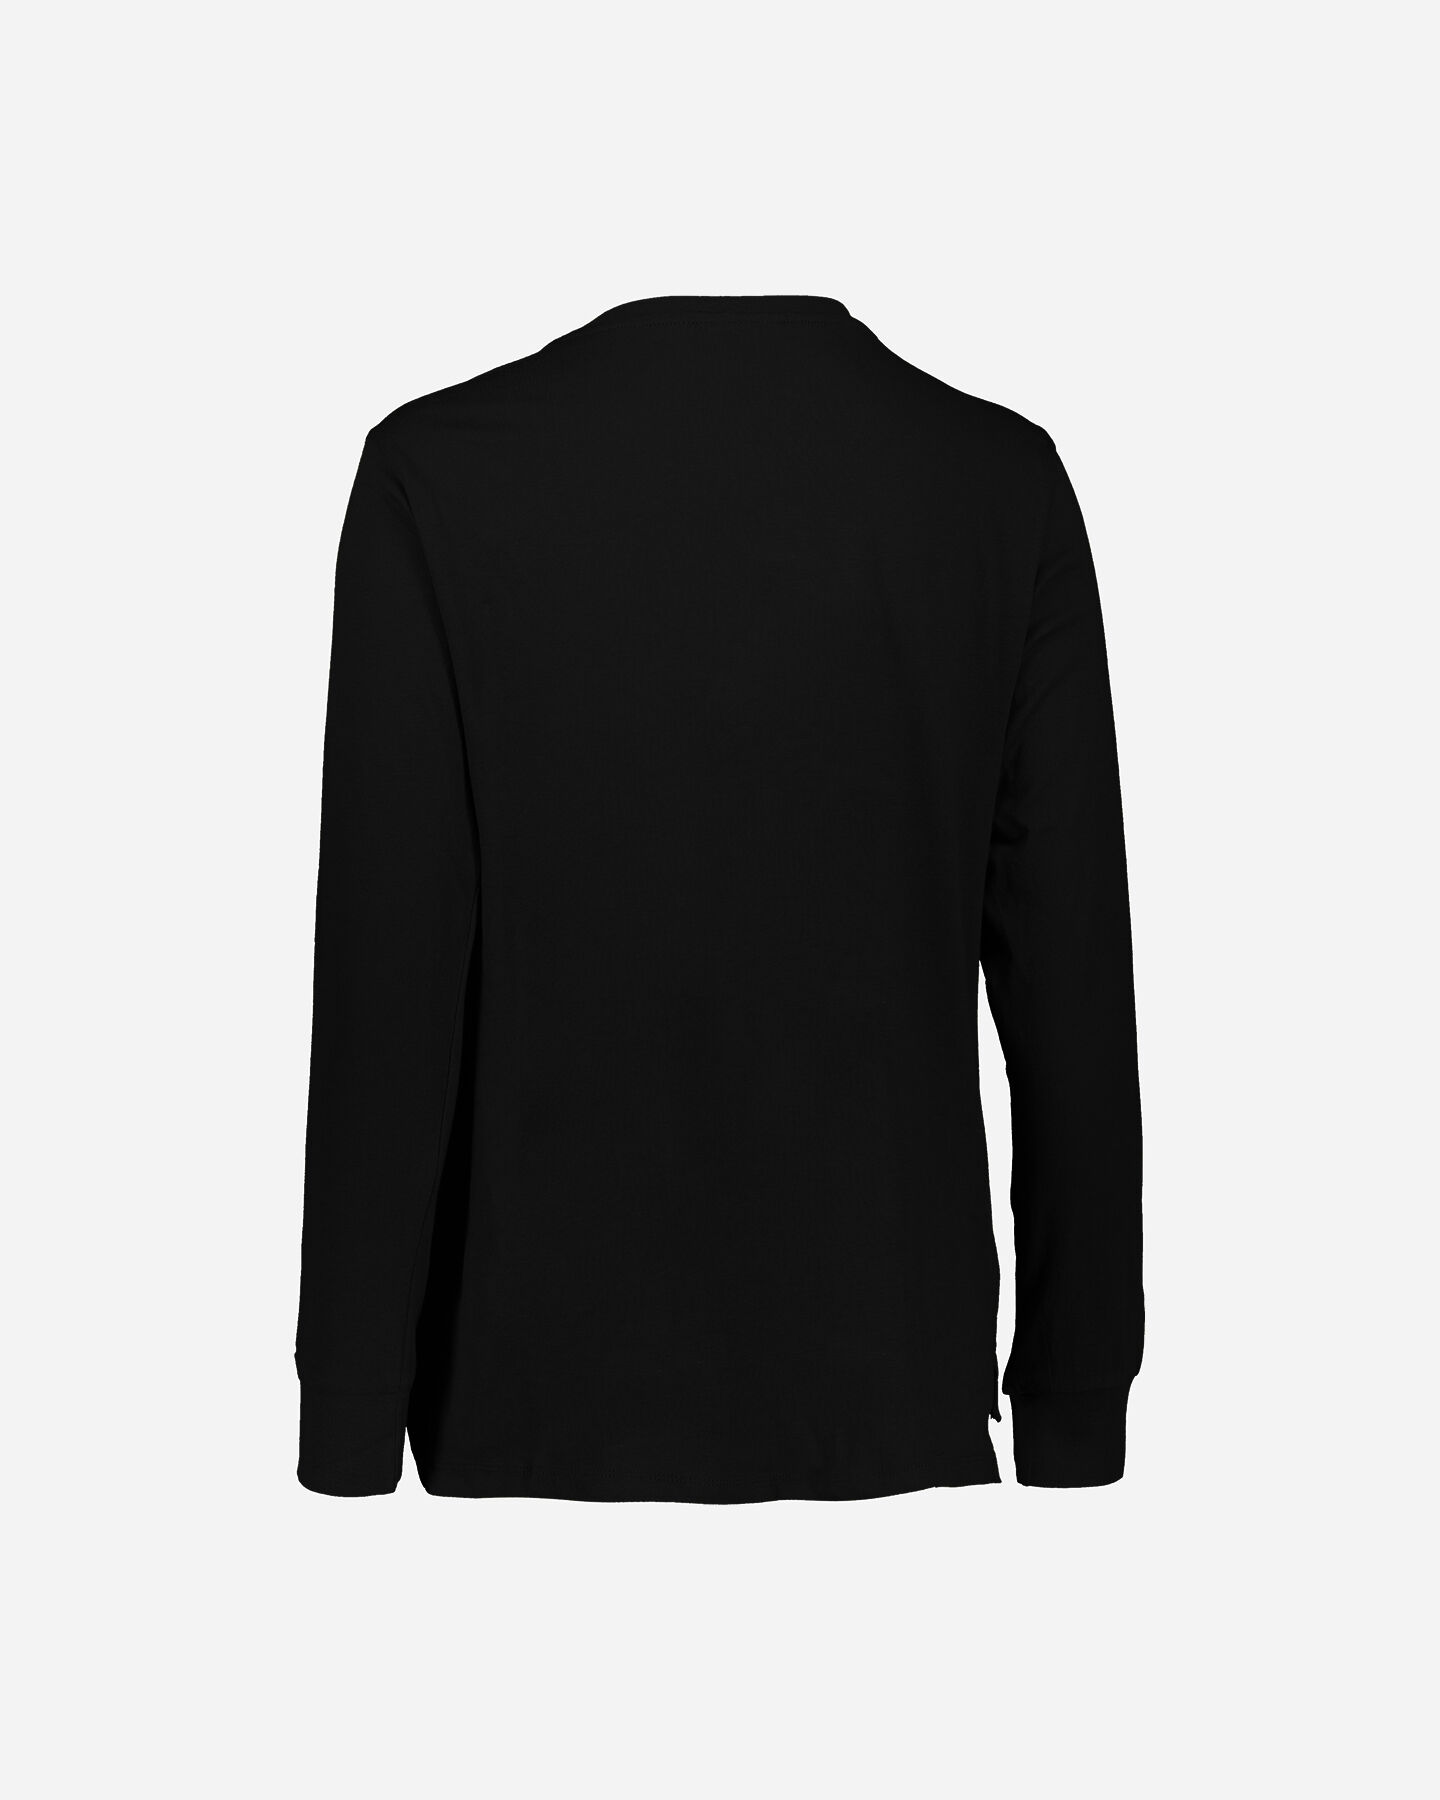 T-Shirt FREDDY SMALL LOGO W S5245272 scatto 1